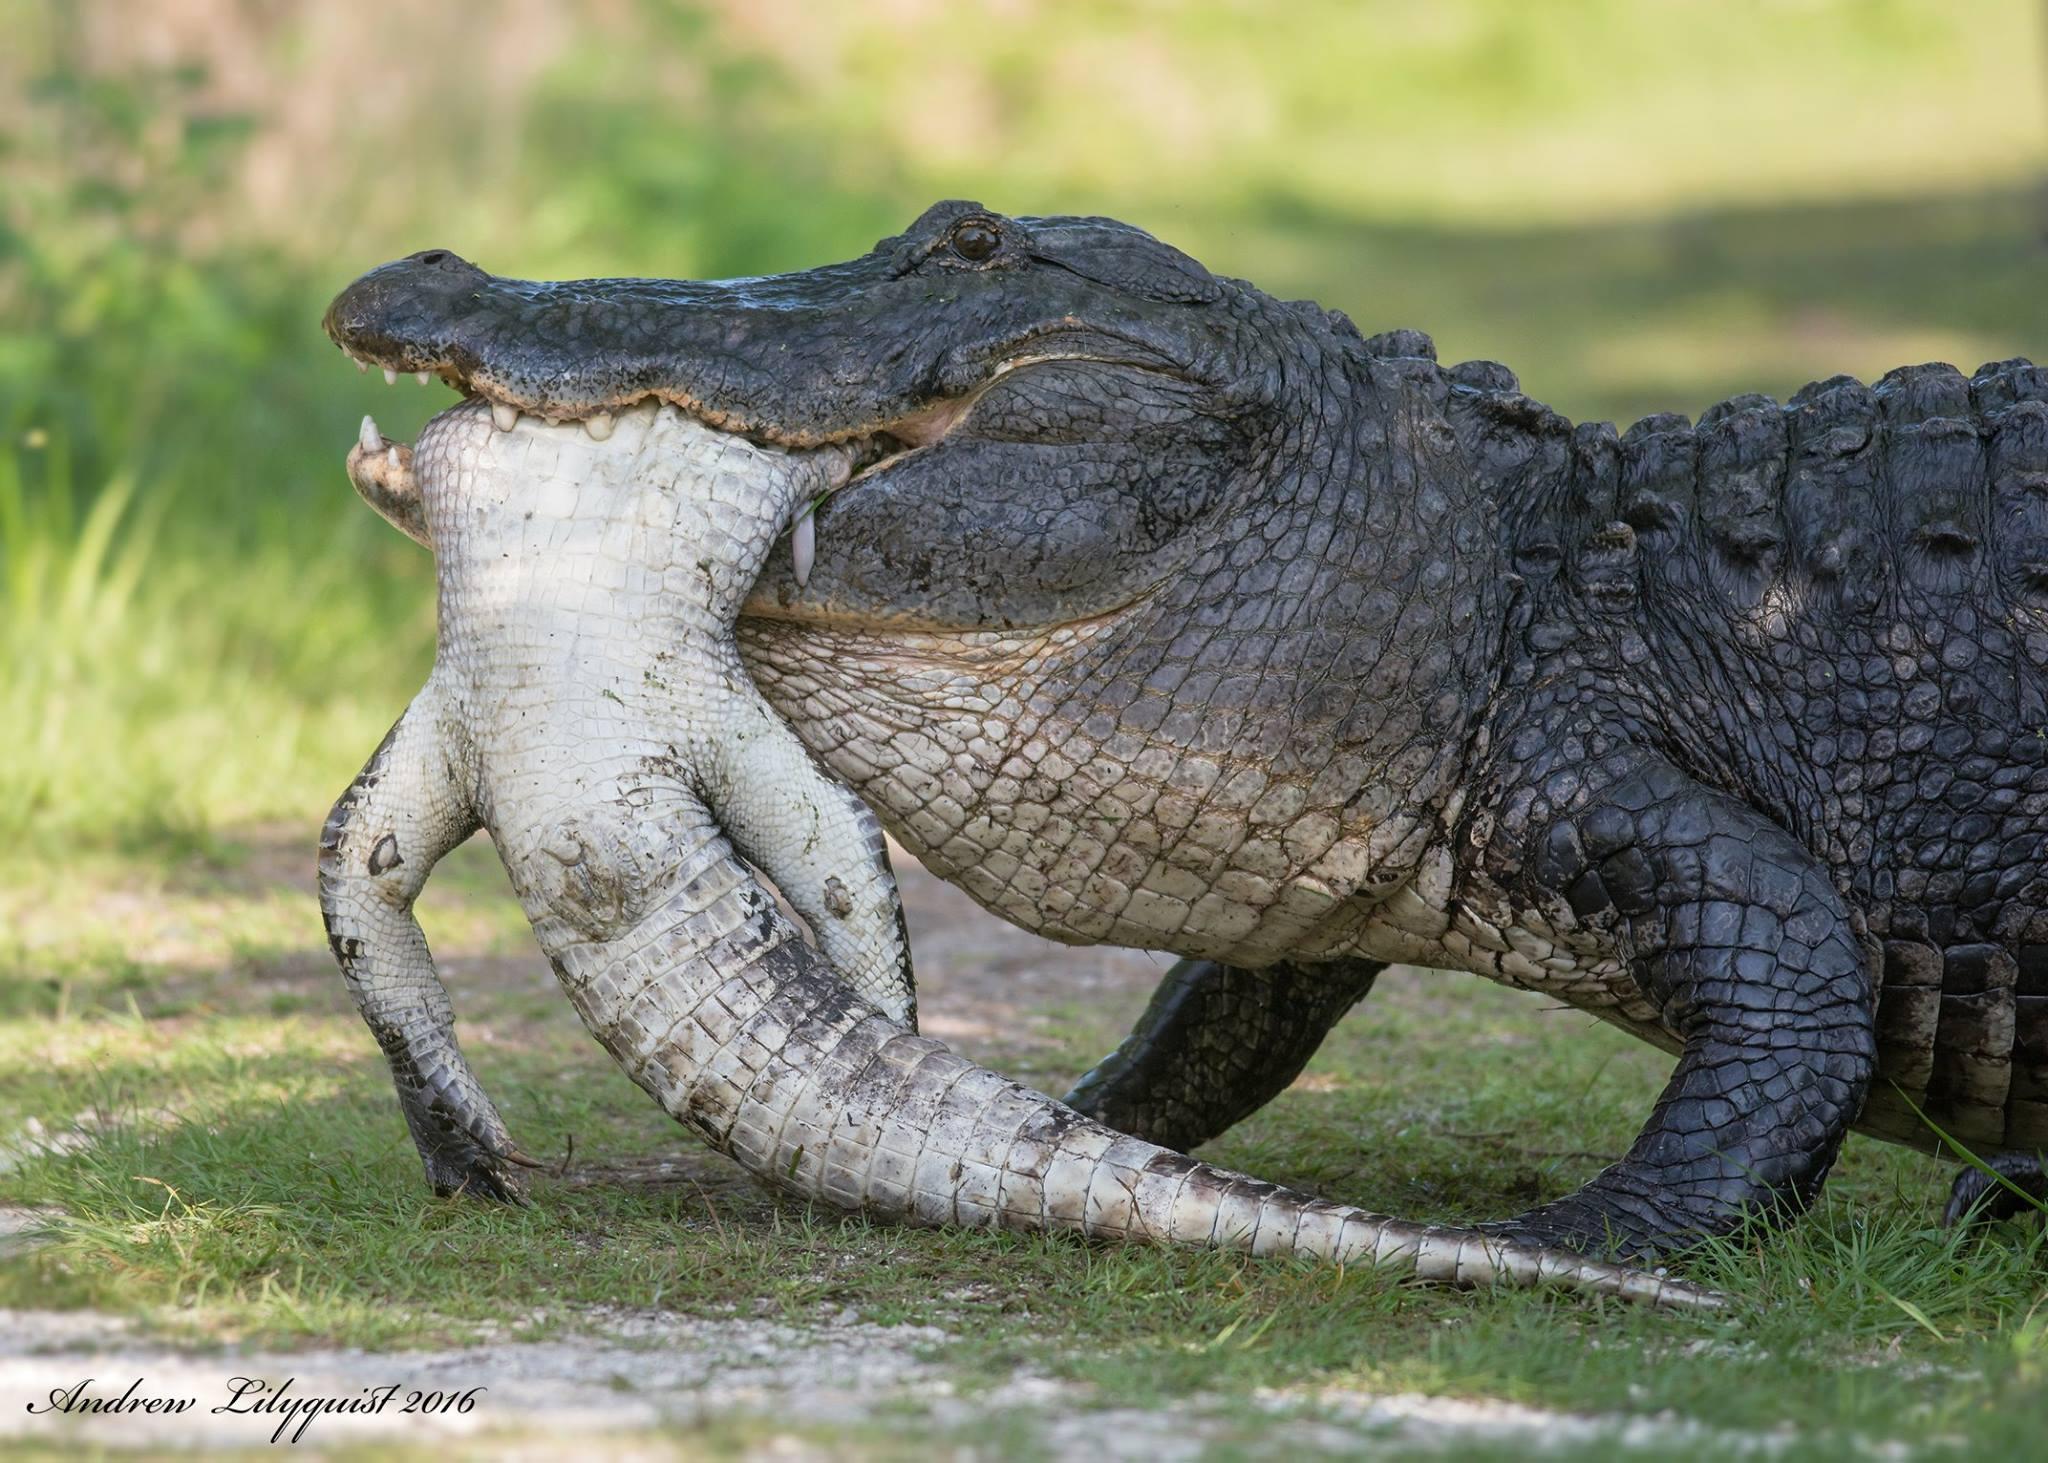 Alligator eats Alligator, Andrew Lilyquist